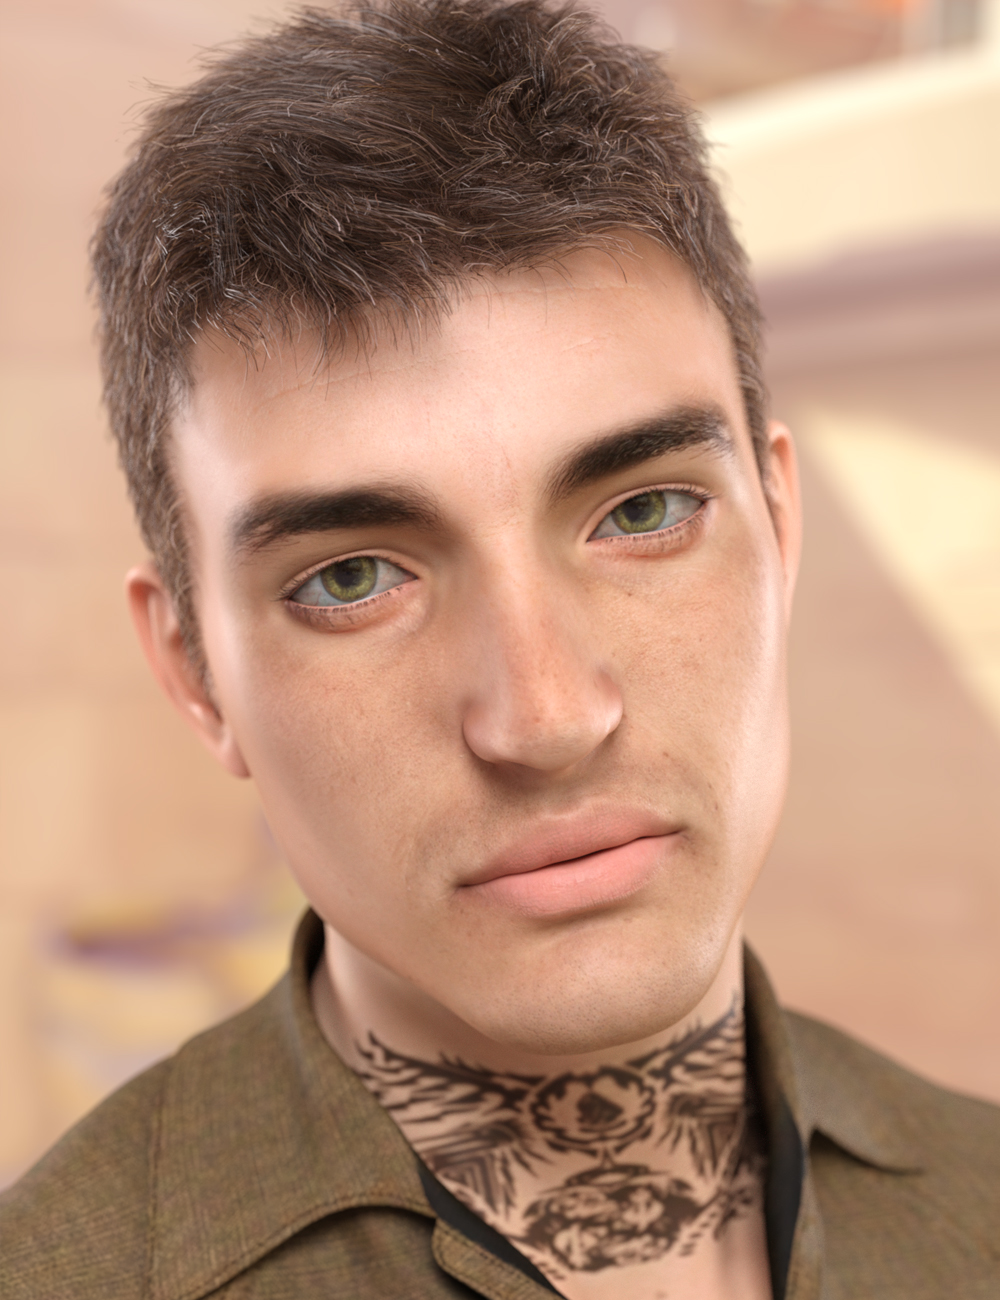 Robert for Genesis 8 Male by: VincentXyooj, 3D Models by Daz 3D